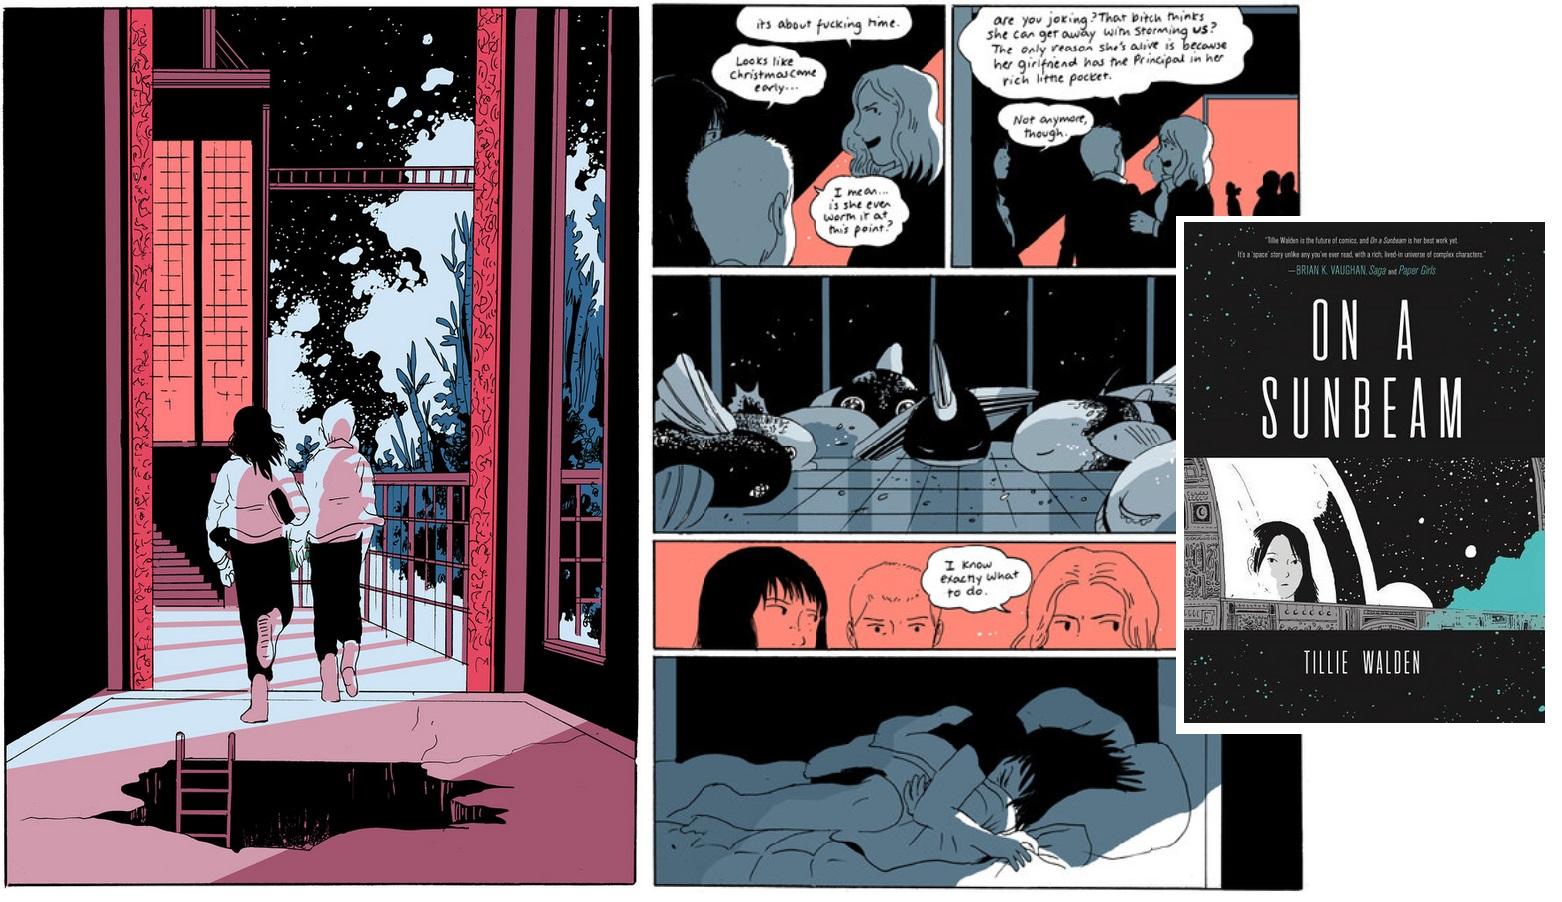 14 b Comics des Jahres - On a Sunbeam